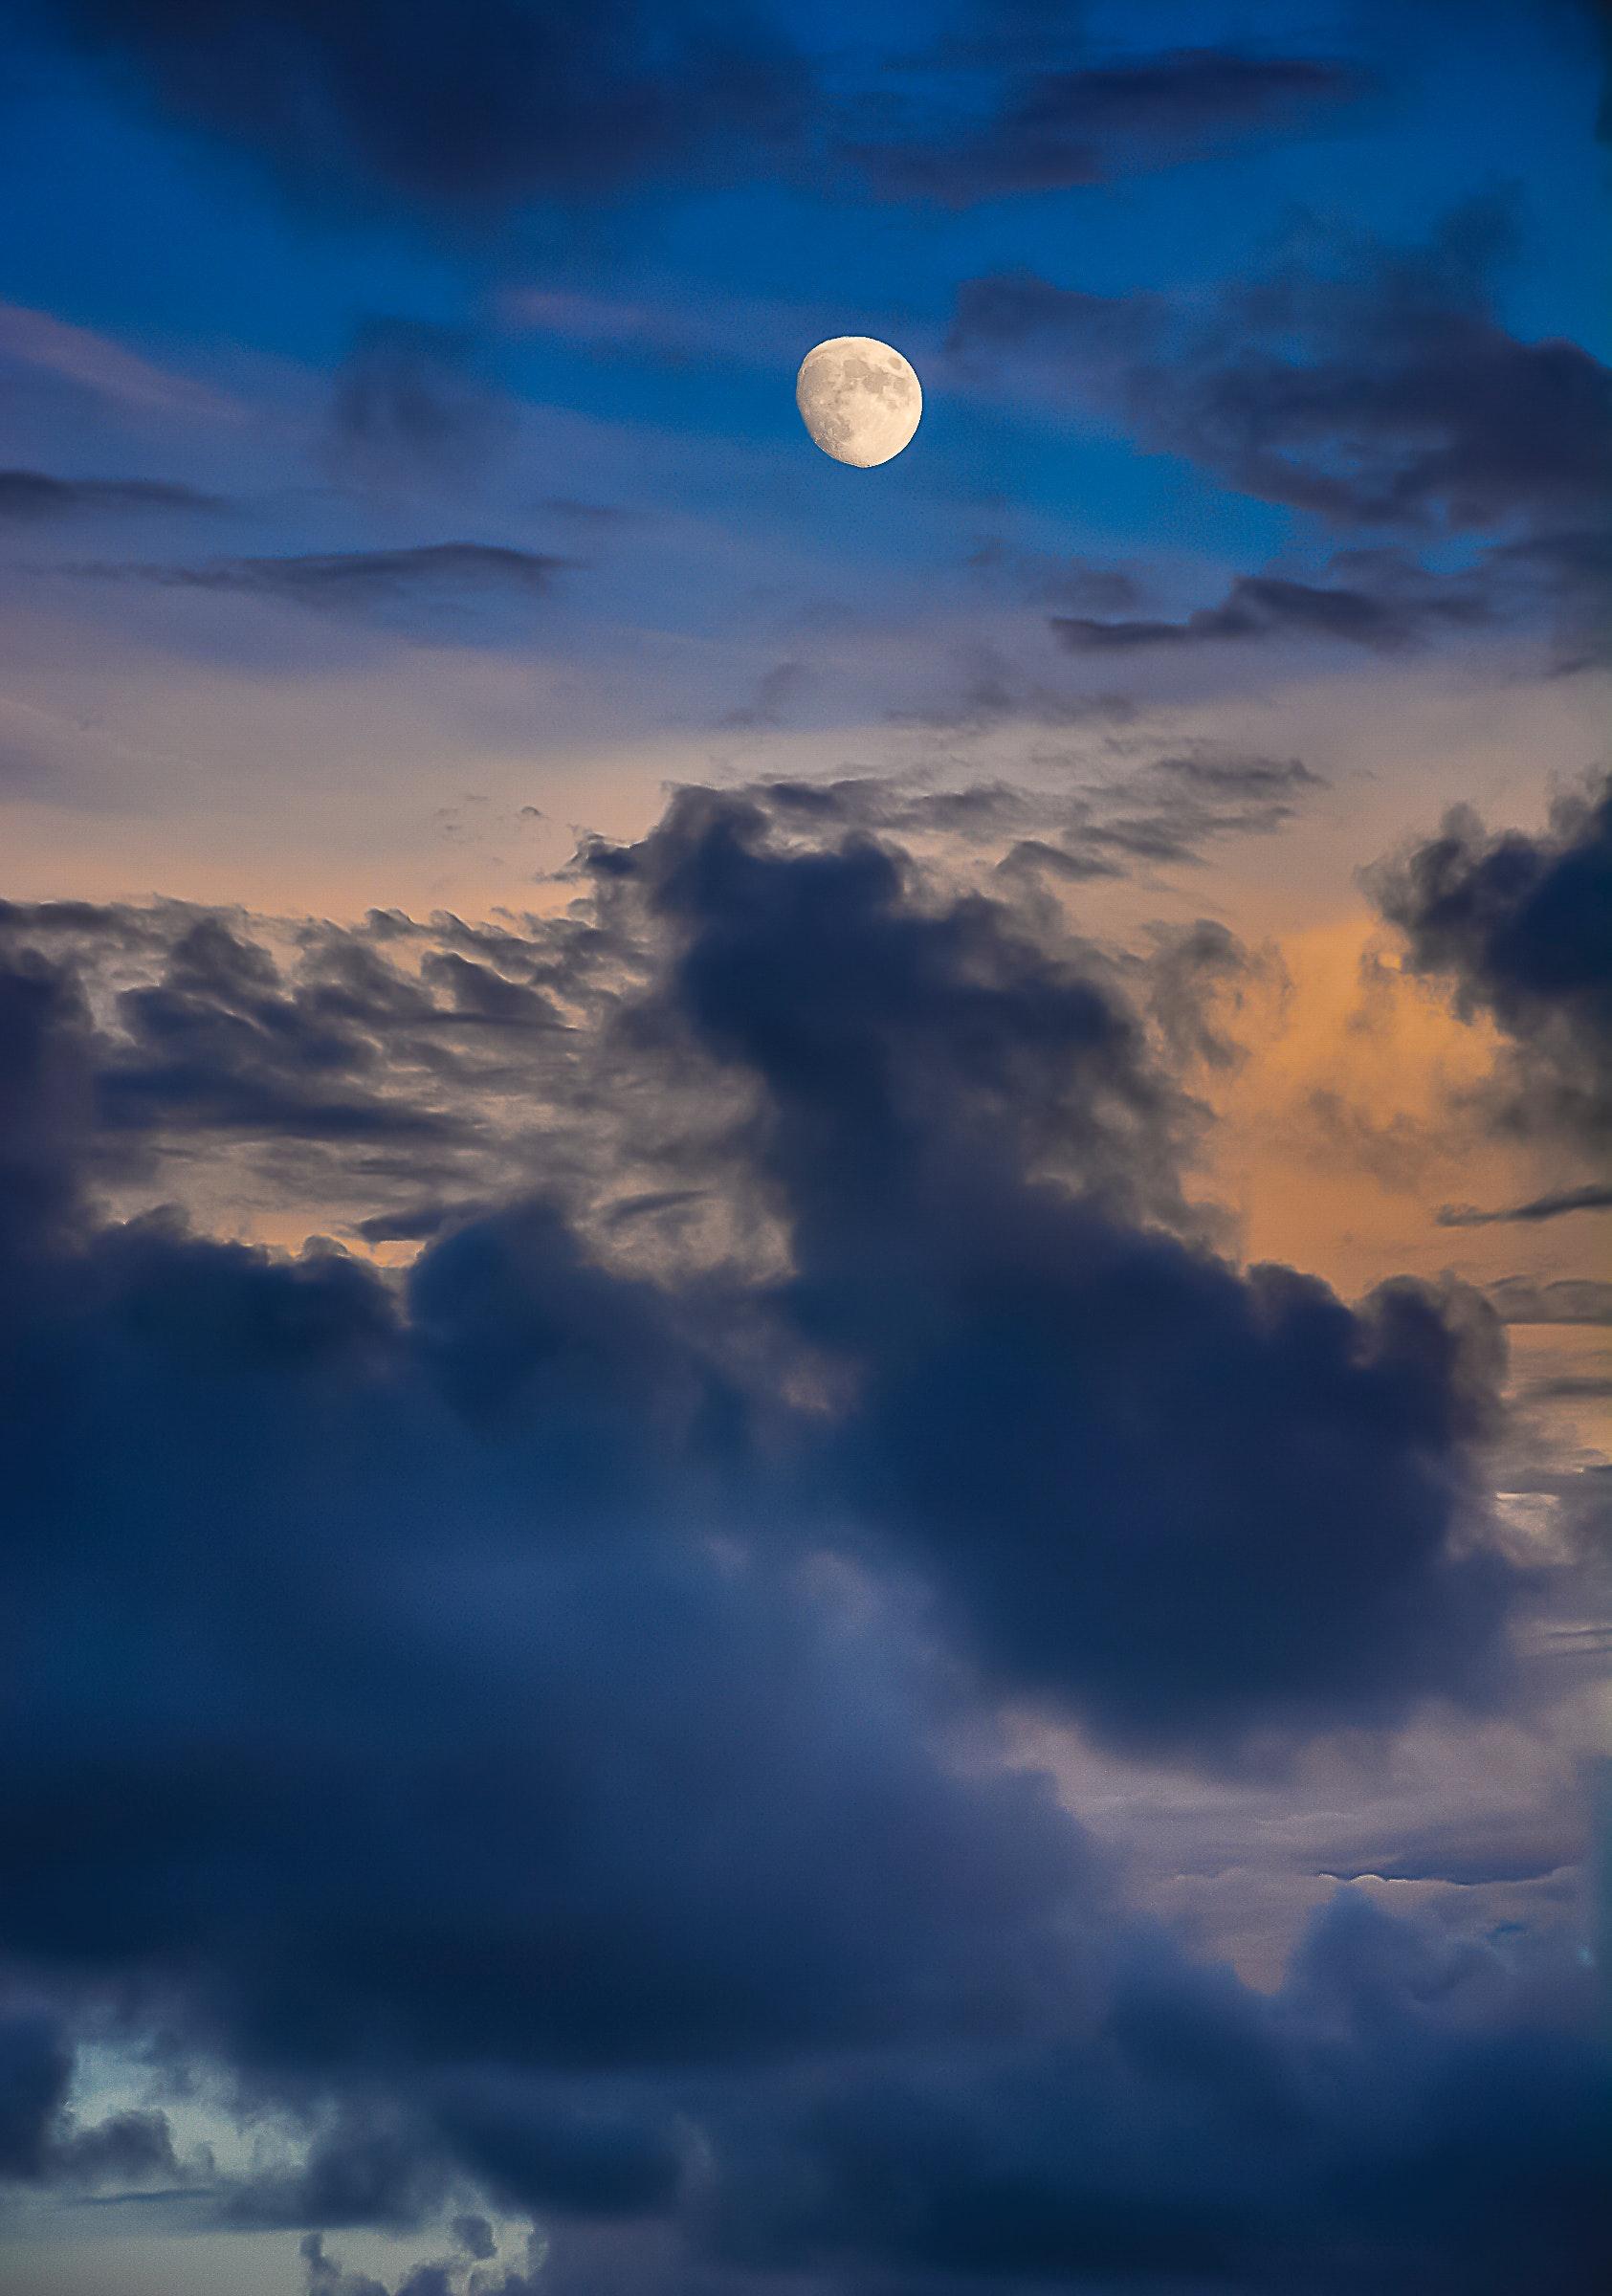 87+ Gambar Awan Dan Bulan Paling Hist